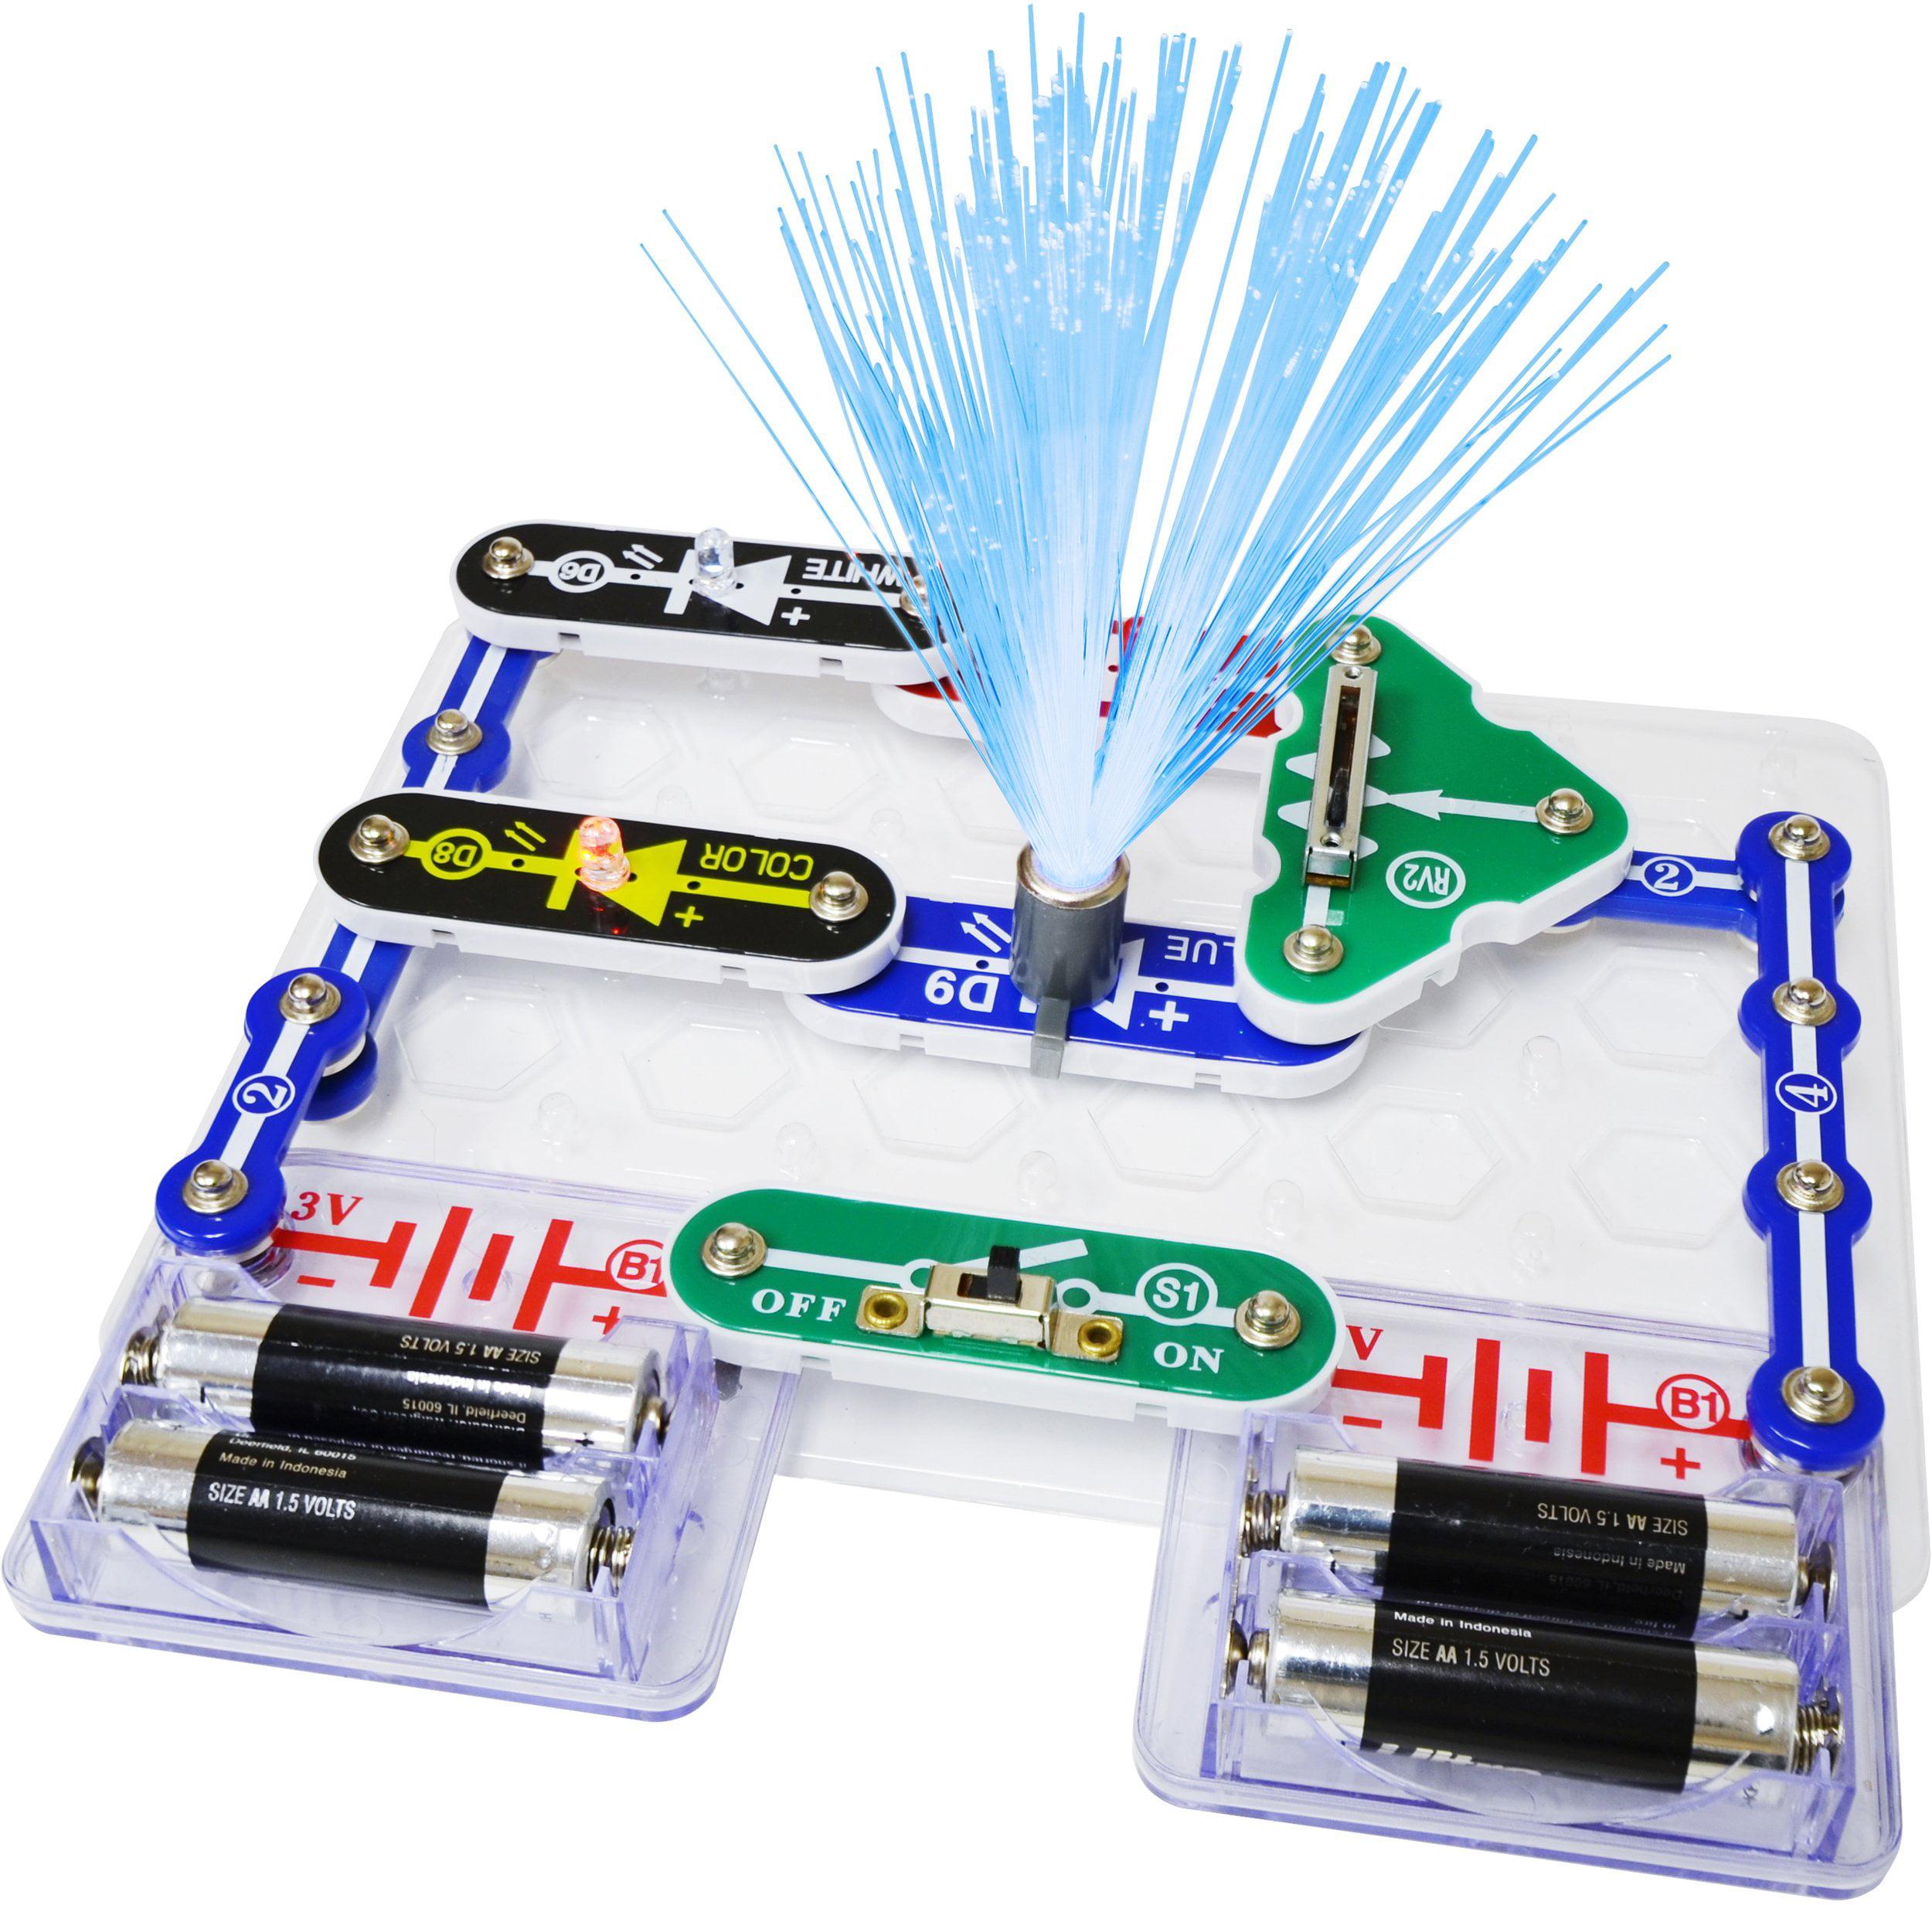 Elenco Electronics Scp 11 Snap Circuits Led Fun Science Kit Electric Qty